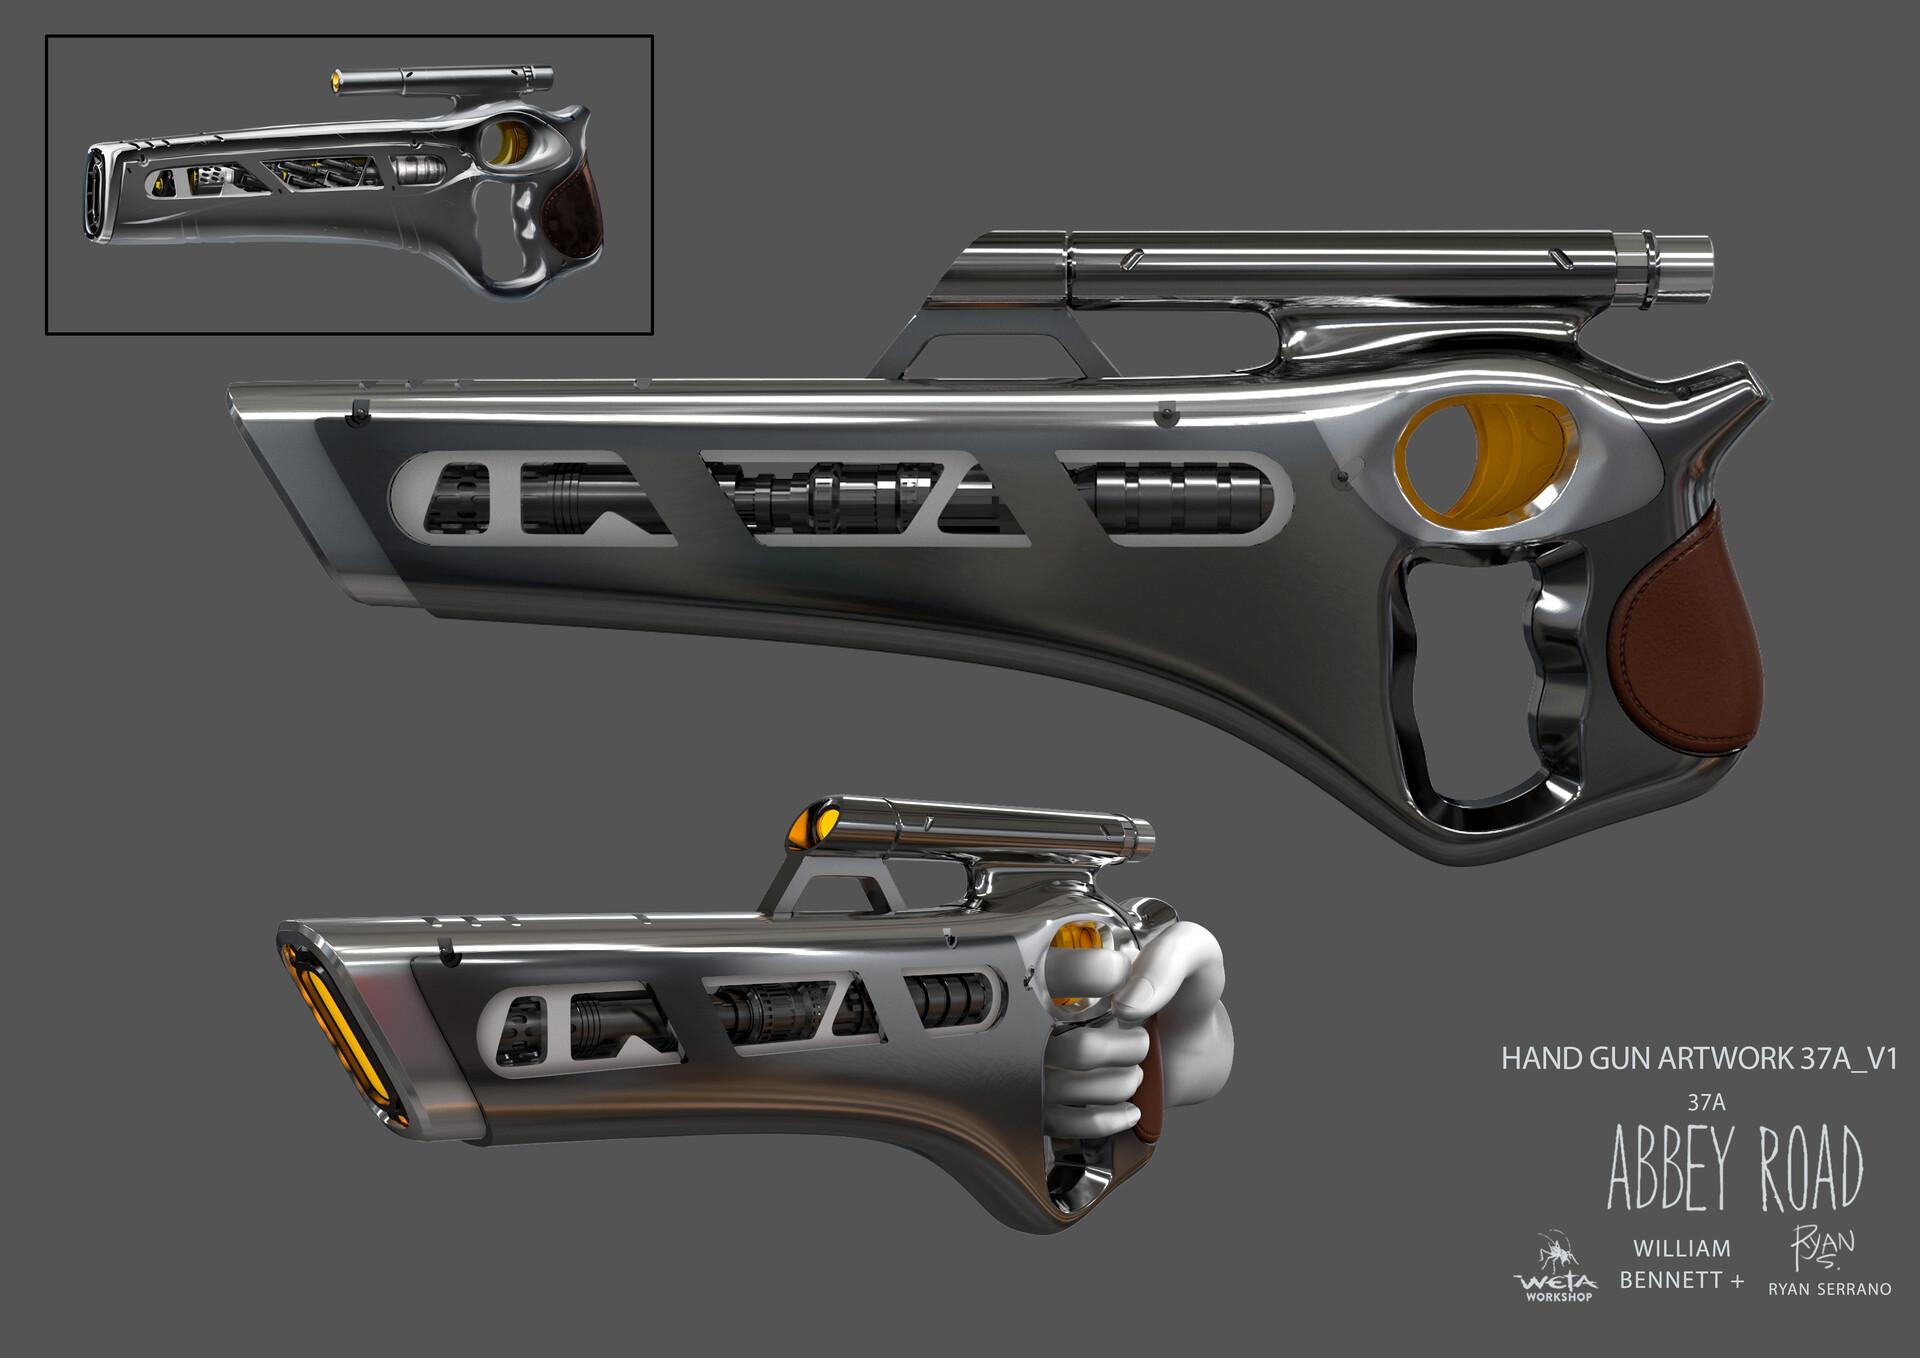 Handgun - Artists: William Bennett + Ryan Serrano